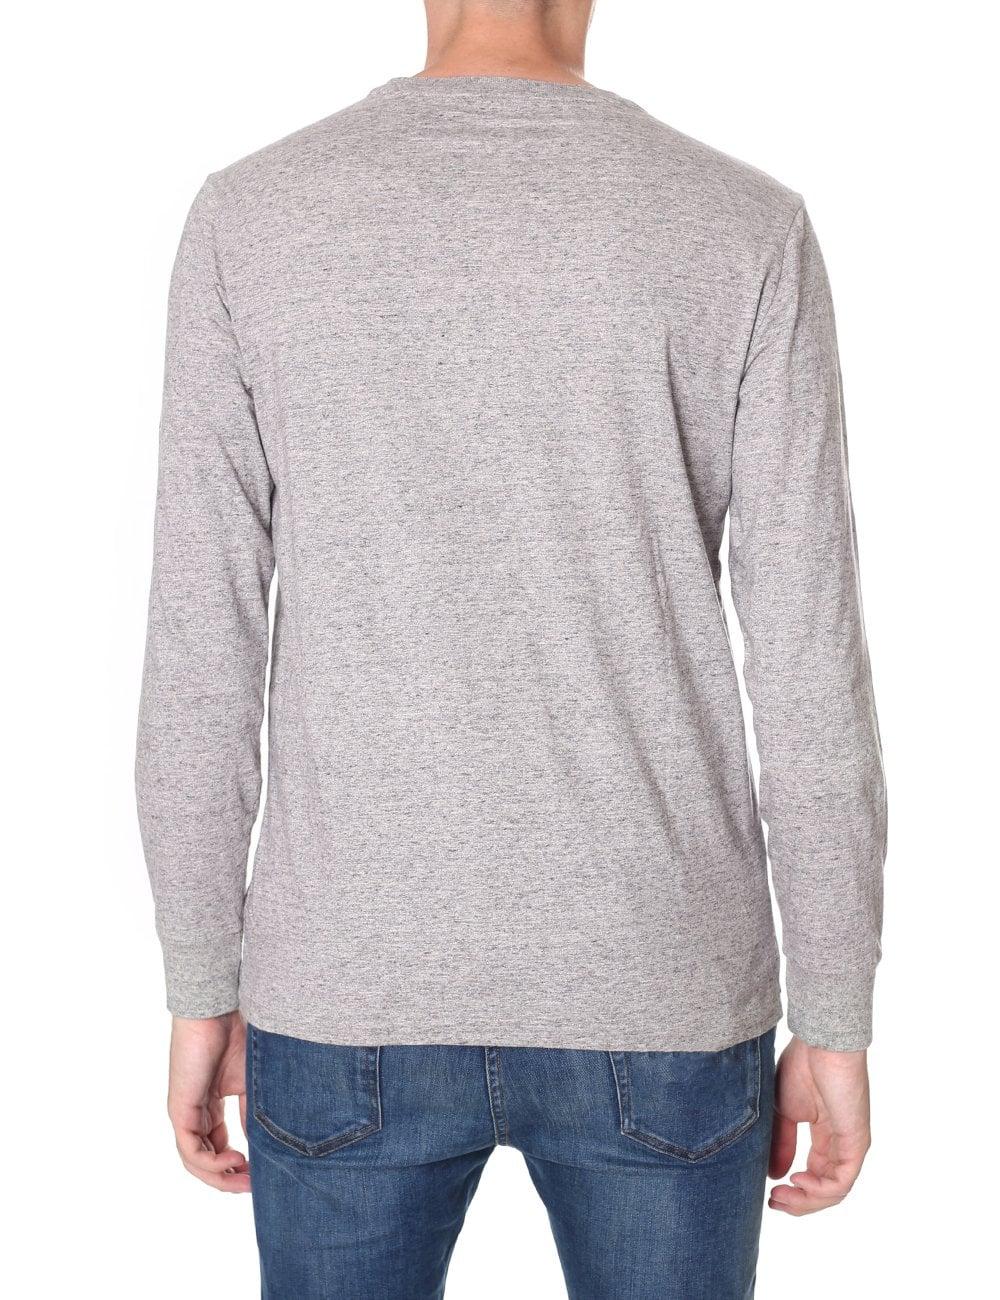 8f455726955ca Polo Ralph Lauren Custom Fit Men s Long Sleeve Tee Dark Vintage Heather